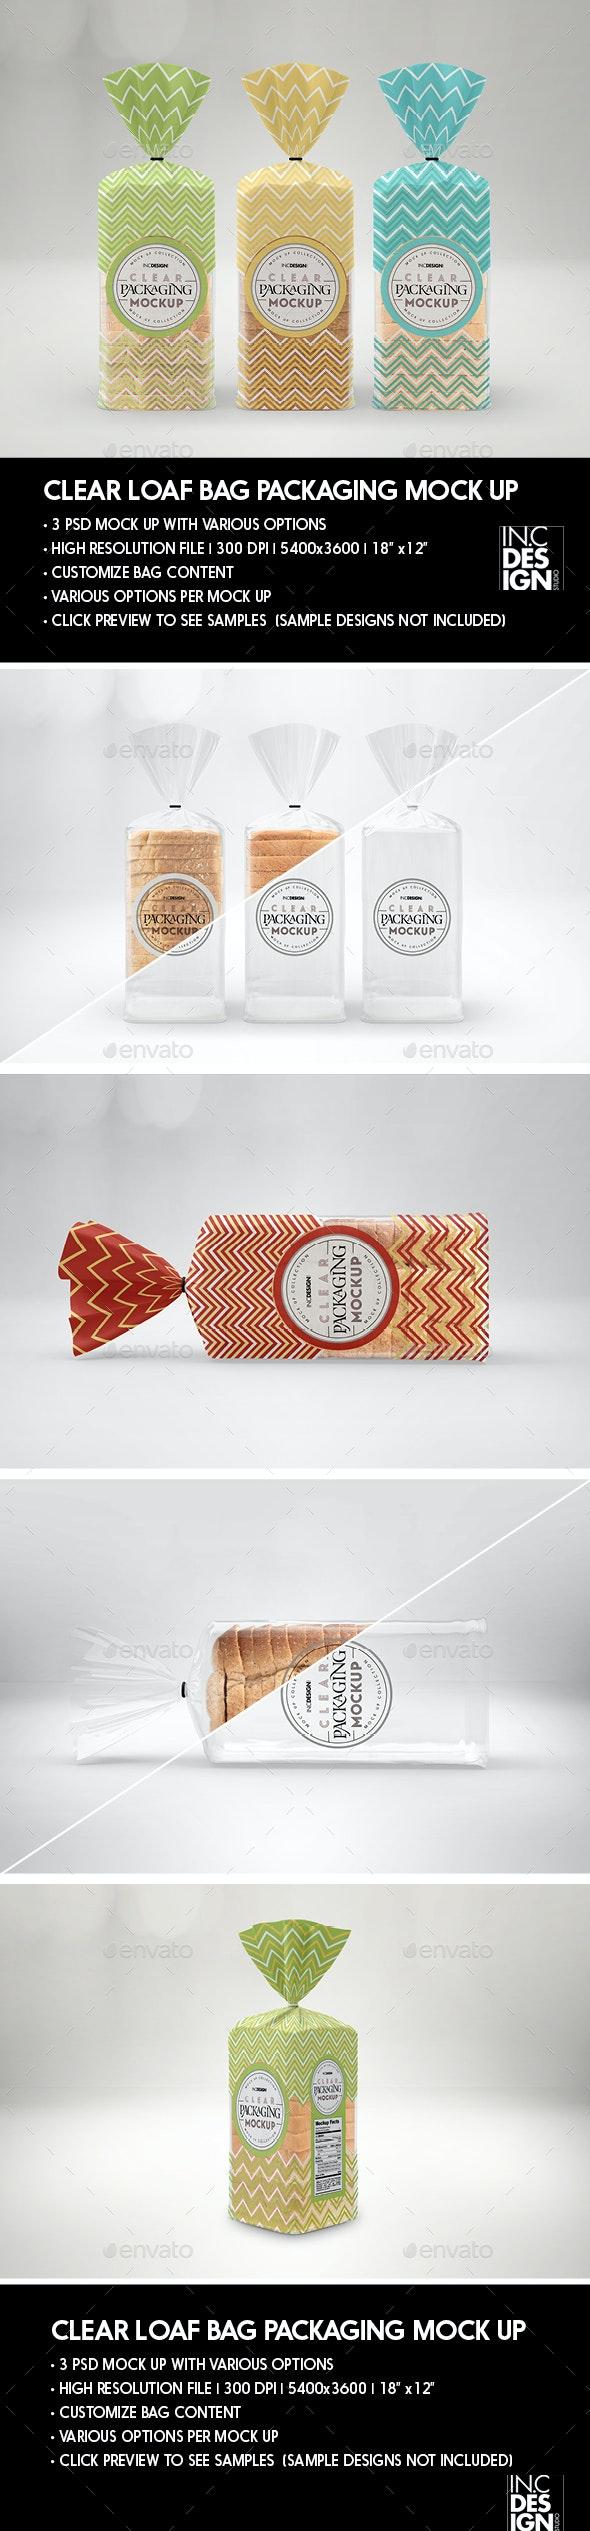 Clear Loaf Bag Packaging Mockup - Packaging Product Mock-Ups